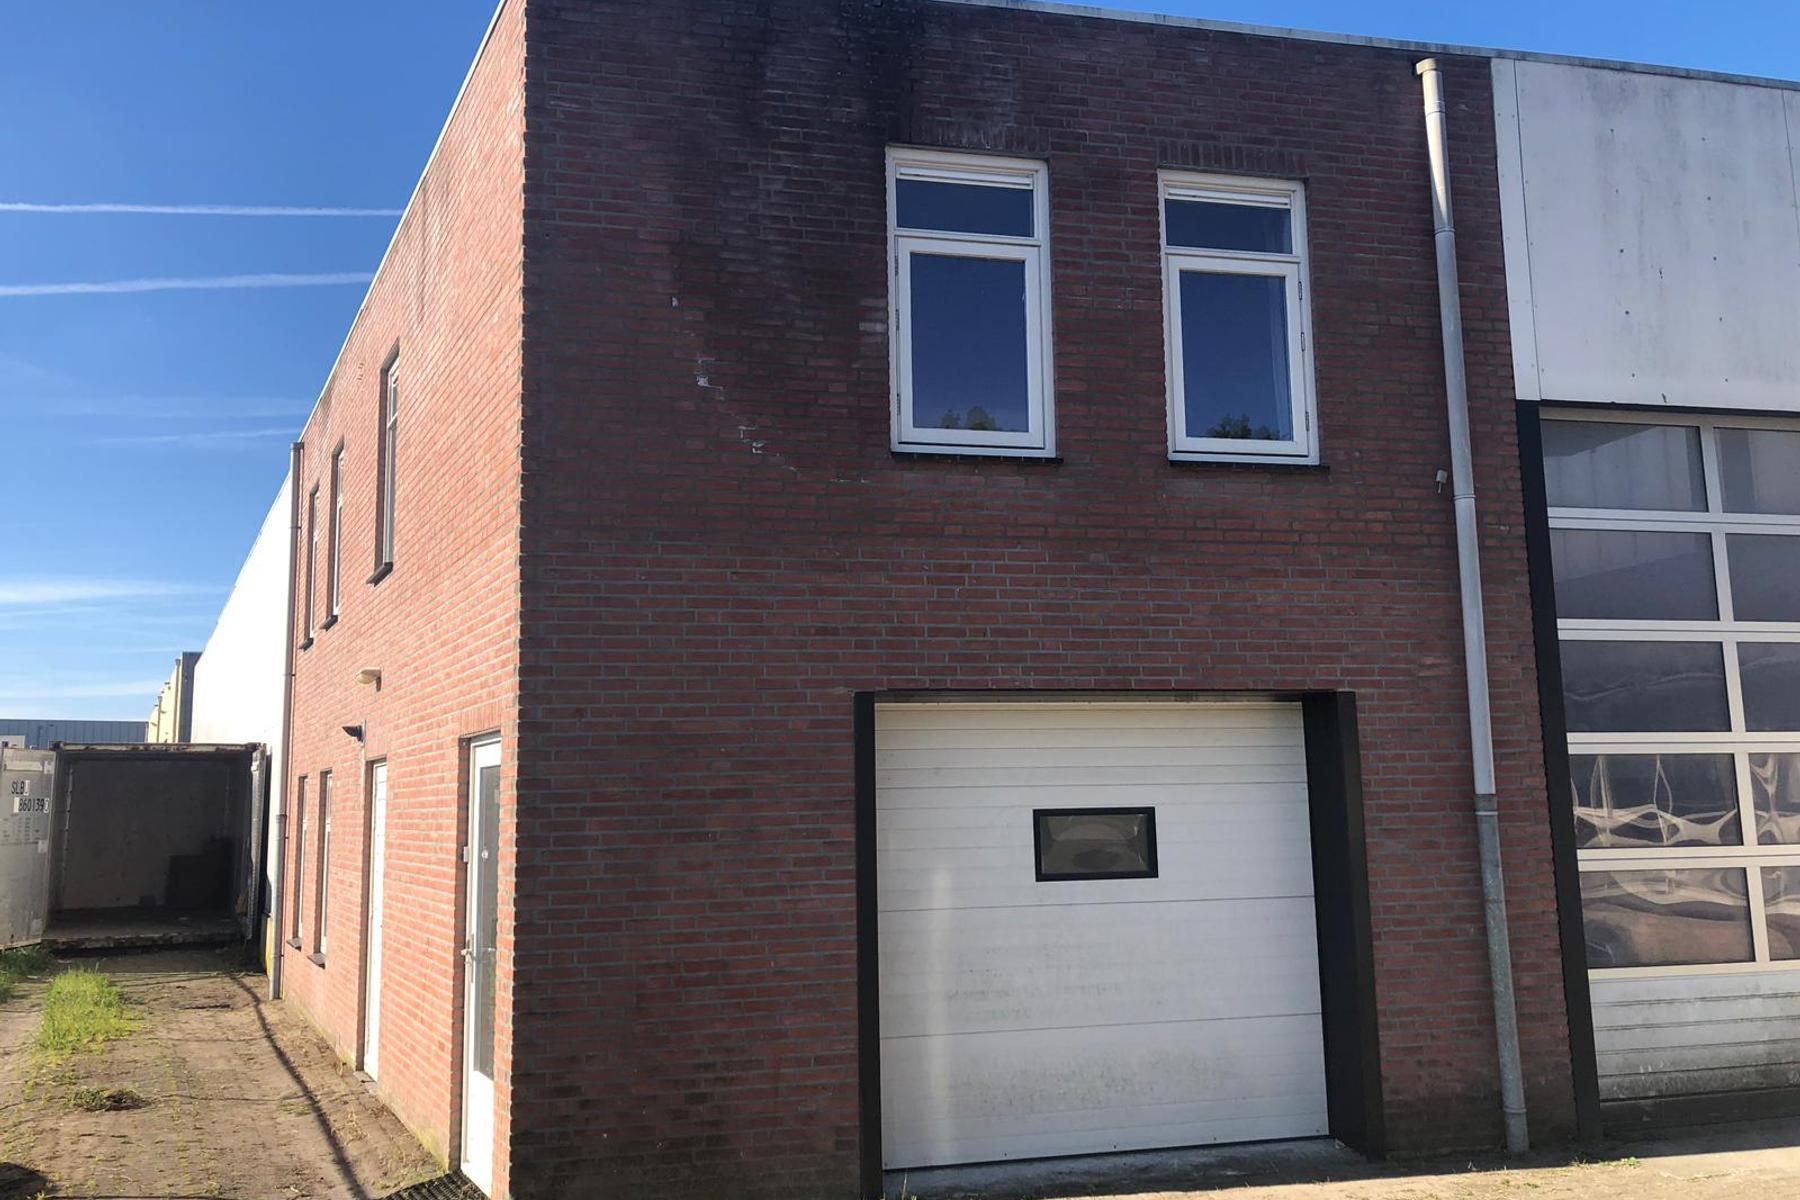 Sprendlingenstraat 8 in Oisterwijk 5061 KN